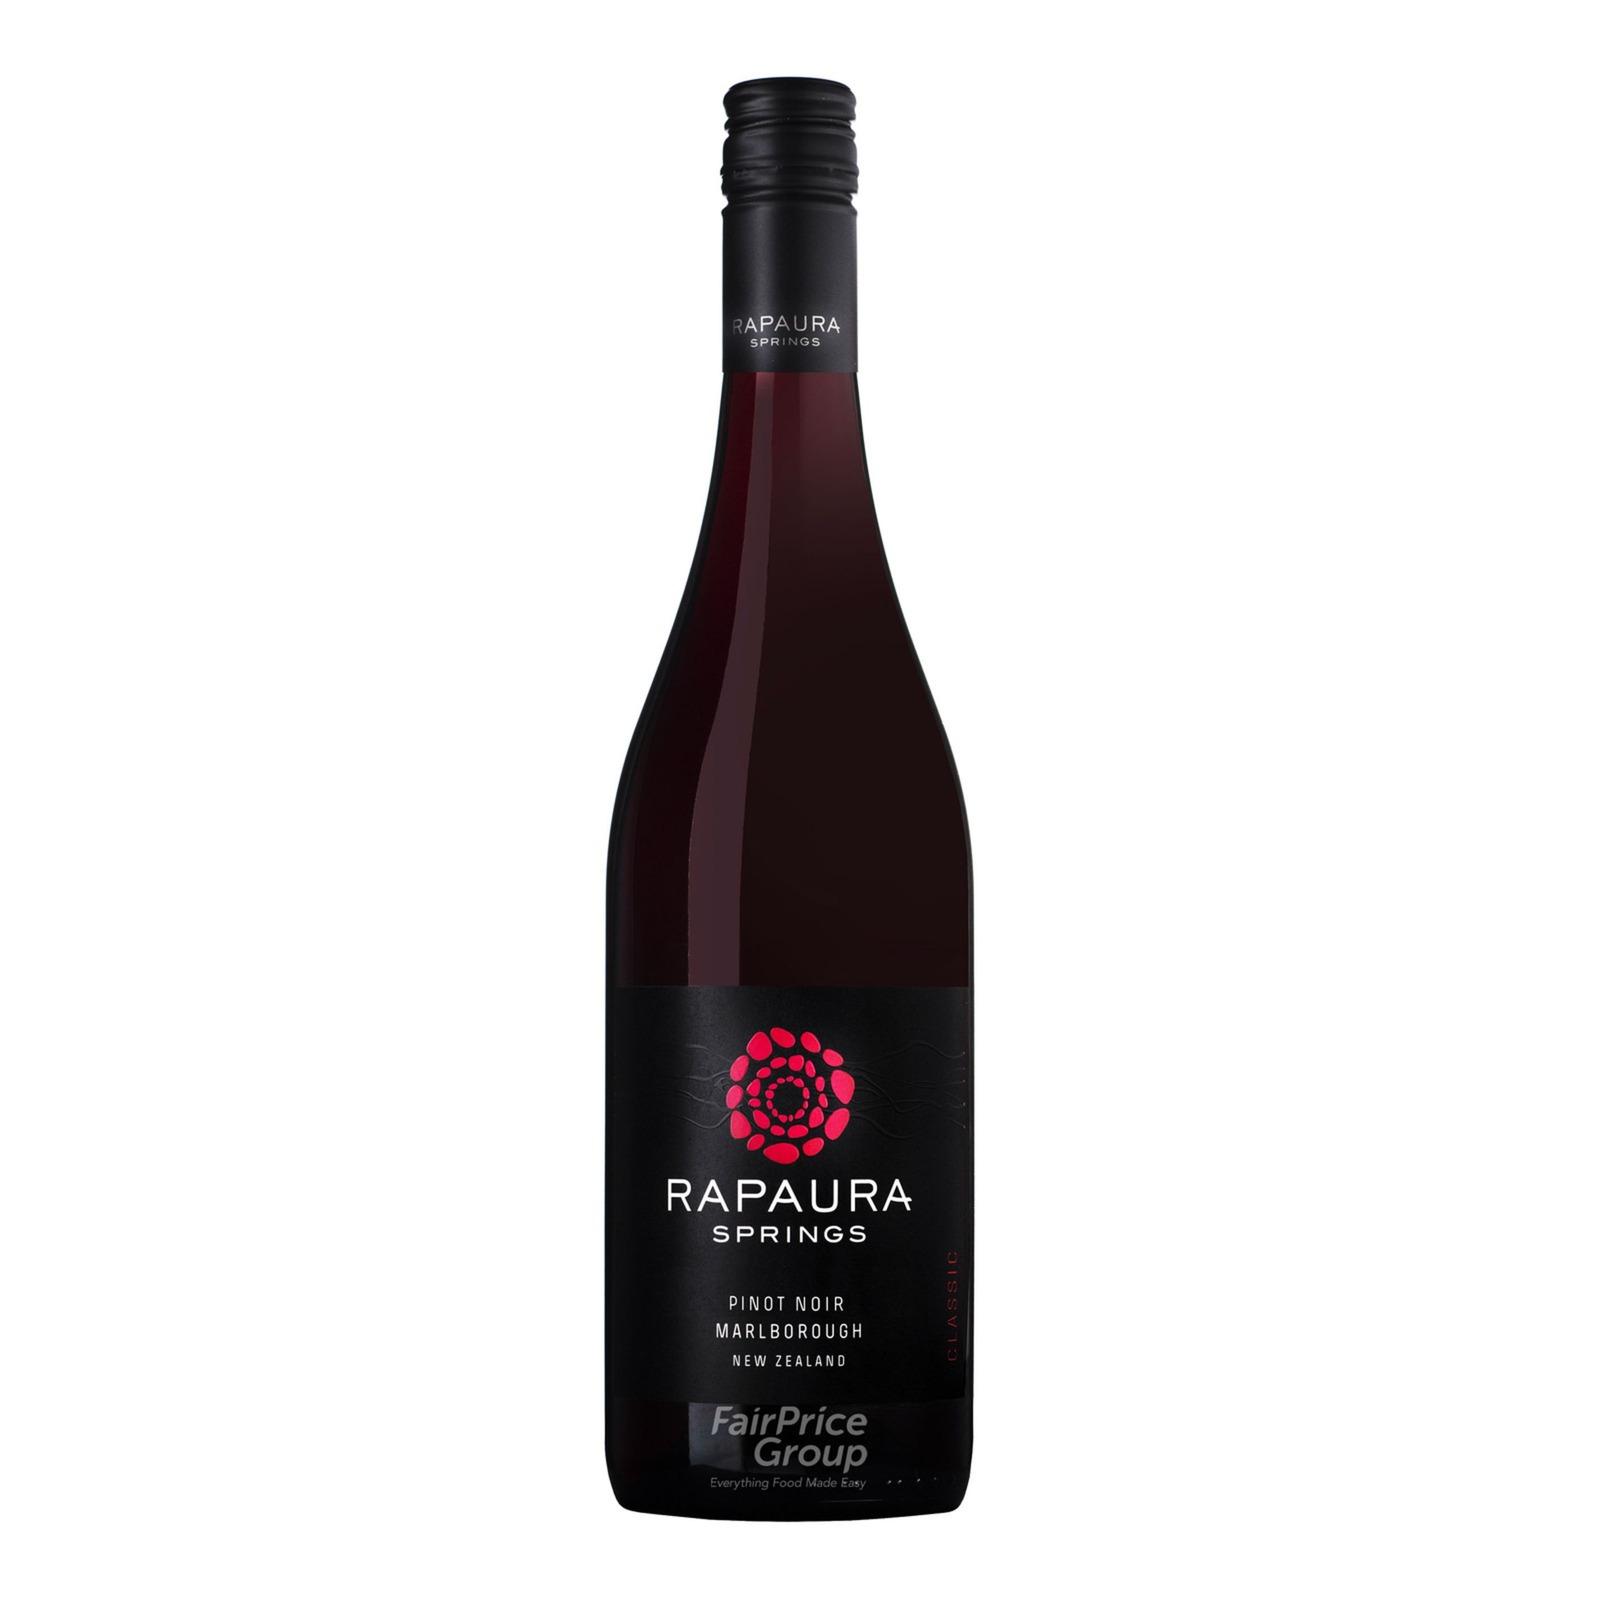 Rapuara Springs Red Wine - Malborough Pinot Noir